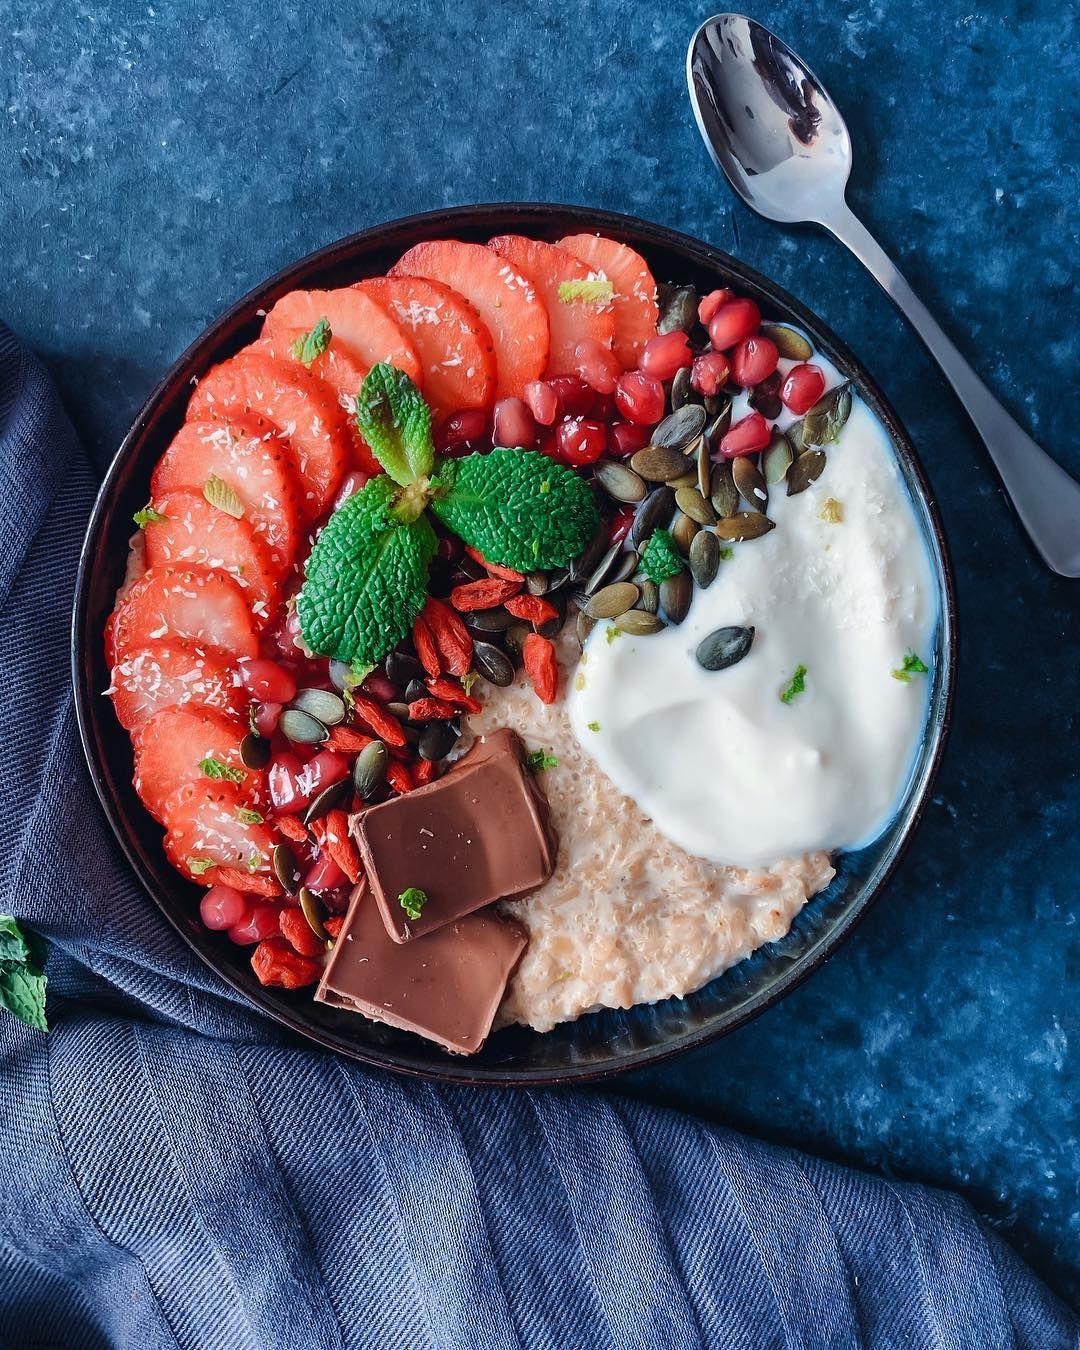 A little treat for Sunday – salted caramel oatmeal & quinoa porridge with 🍓, goji berries, pomegranate seeds, pumpkin seeds, yoghurt & 🍫. – Happy Sunday Lovelies #oatmeal #oatmealbowl #plantbasedbreakfast – Update: please watch...